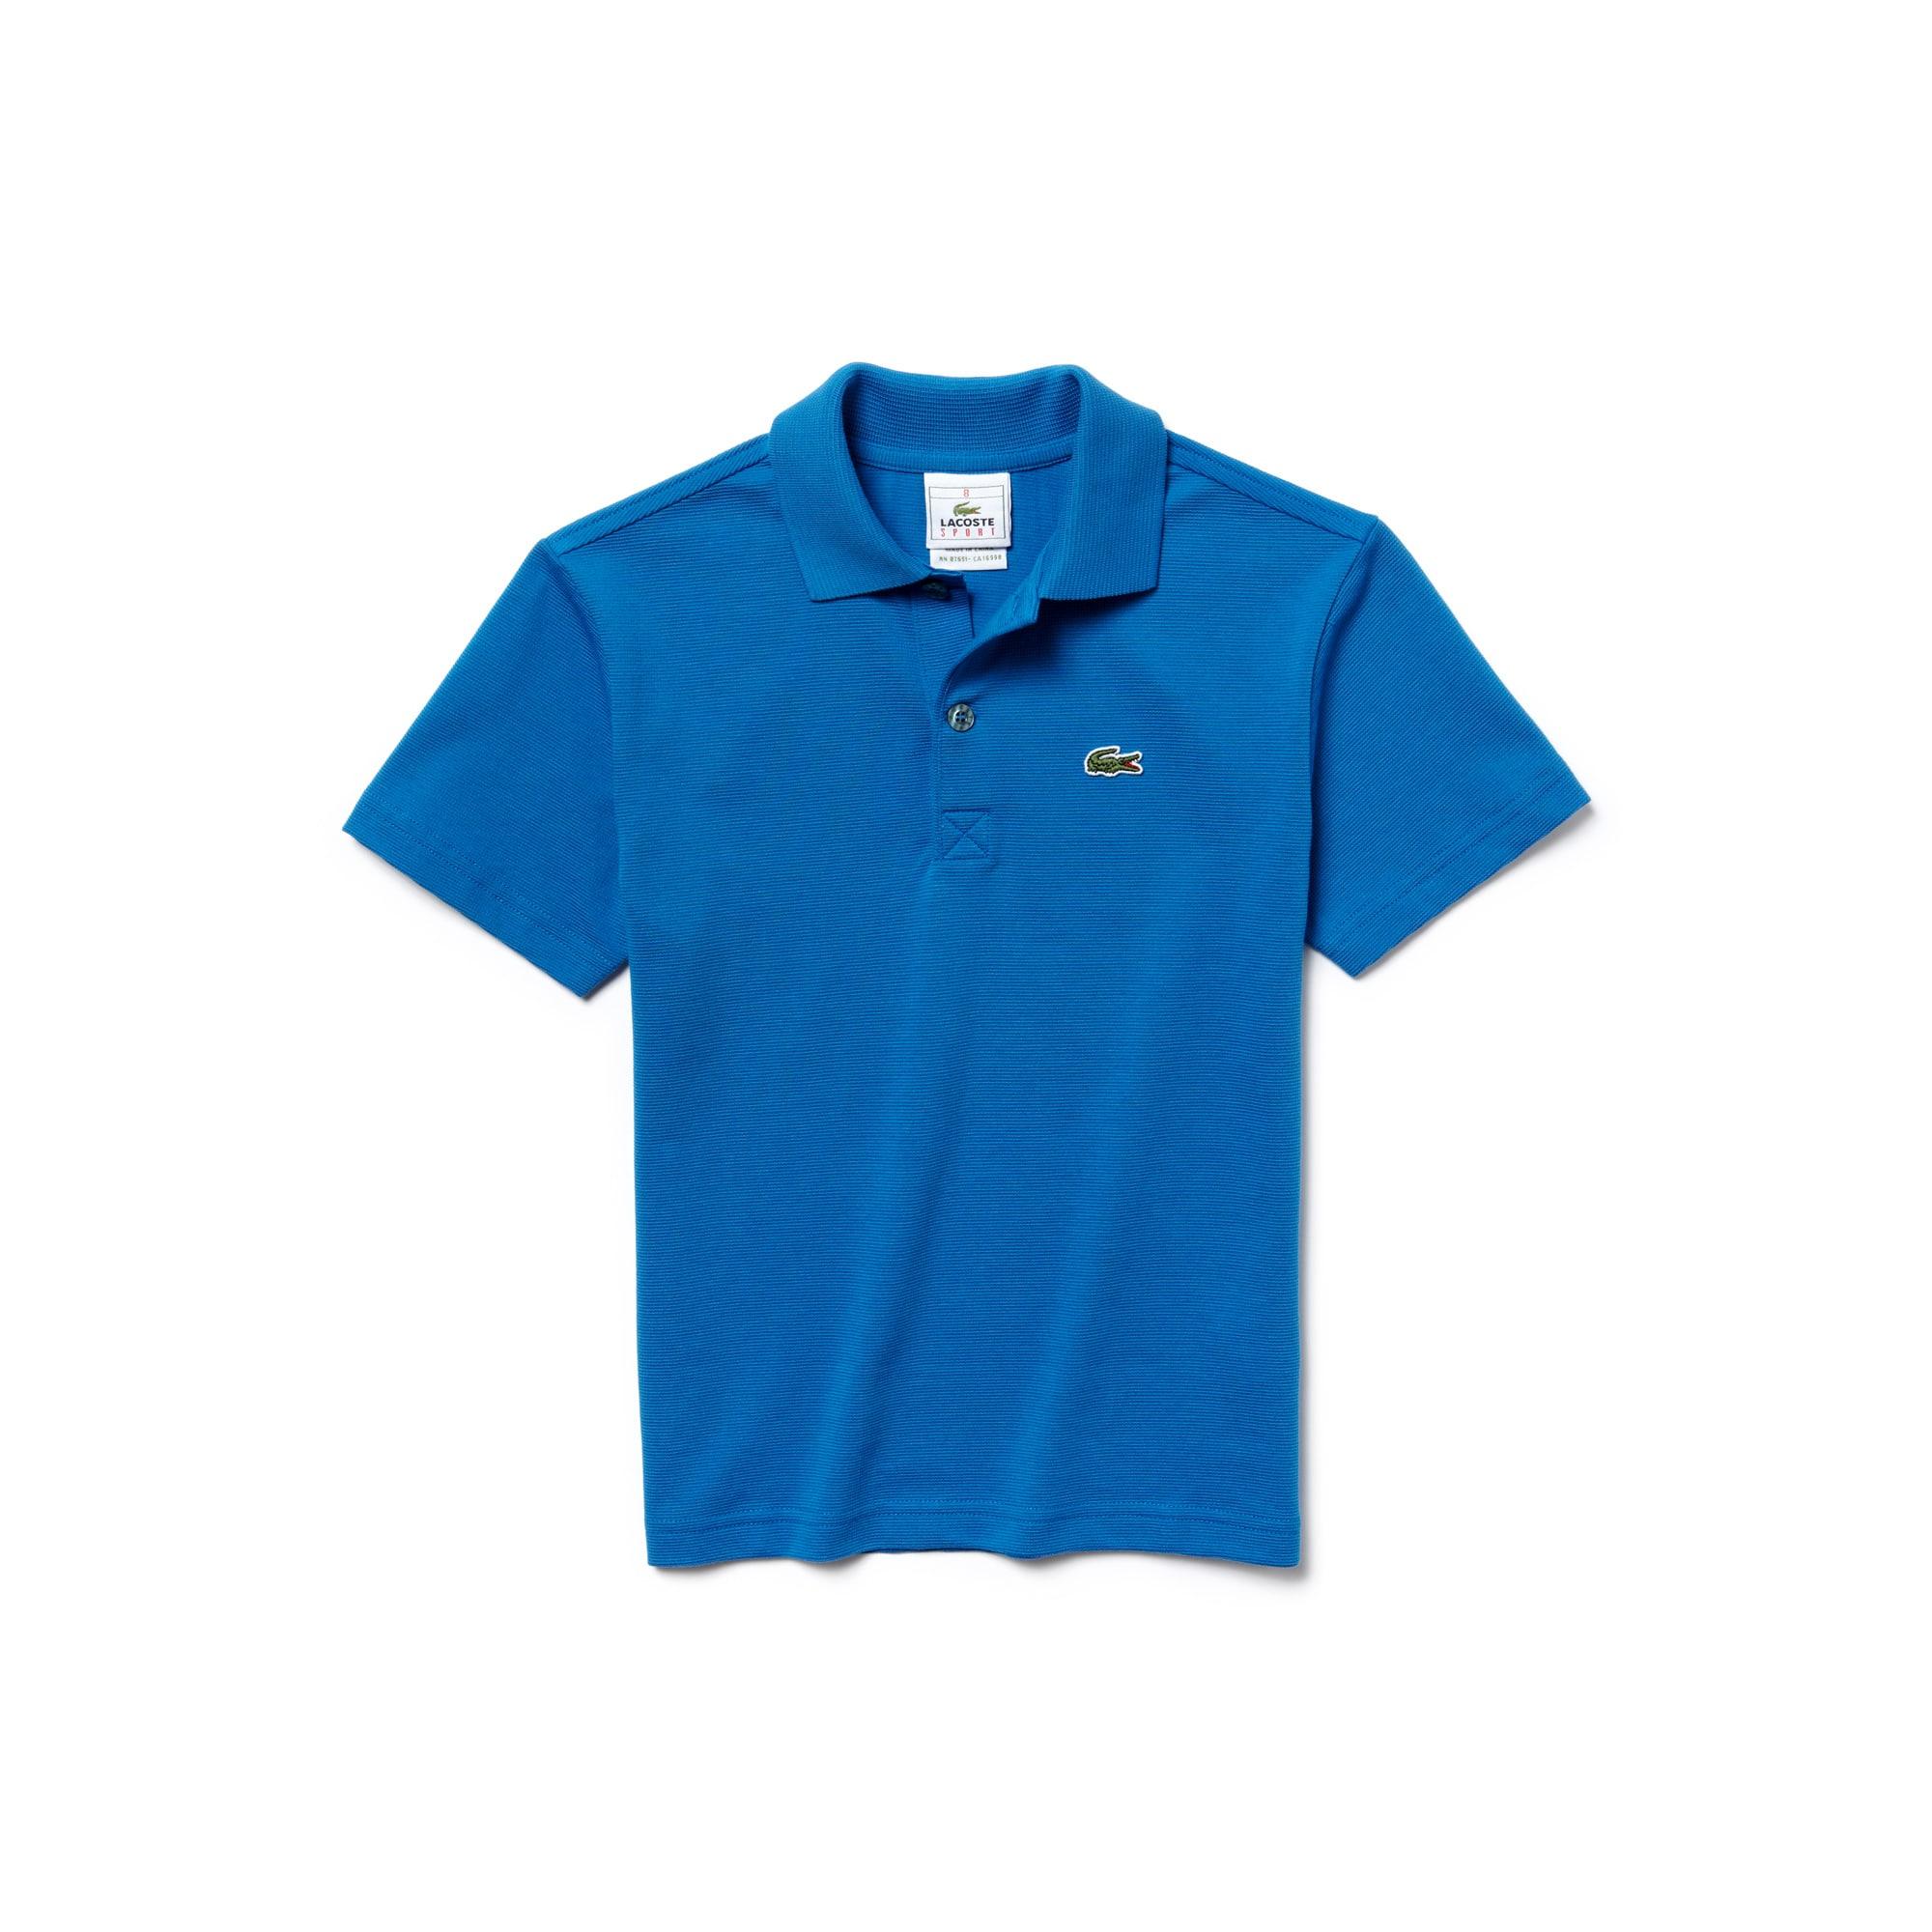 Boys' Lacoste SPORT Colorblock Ultra-Light Cotton Tennis Polo Shirt